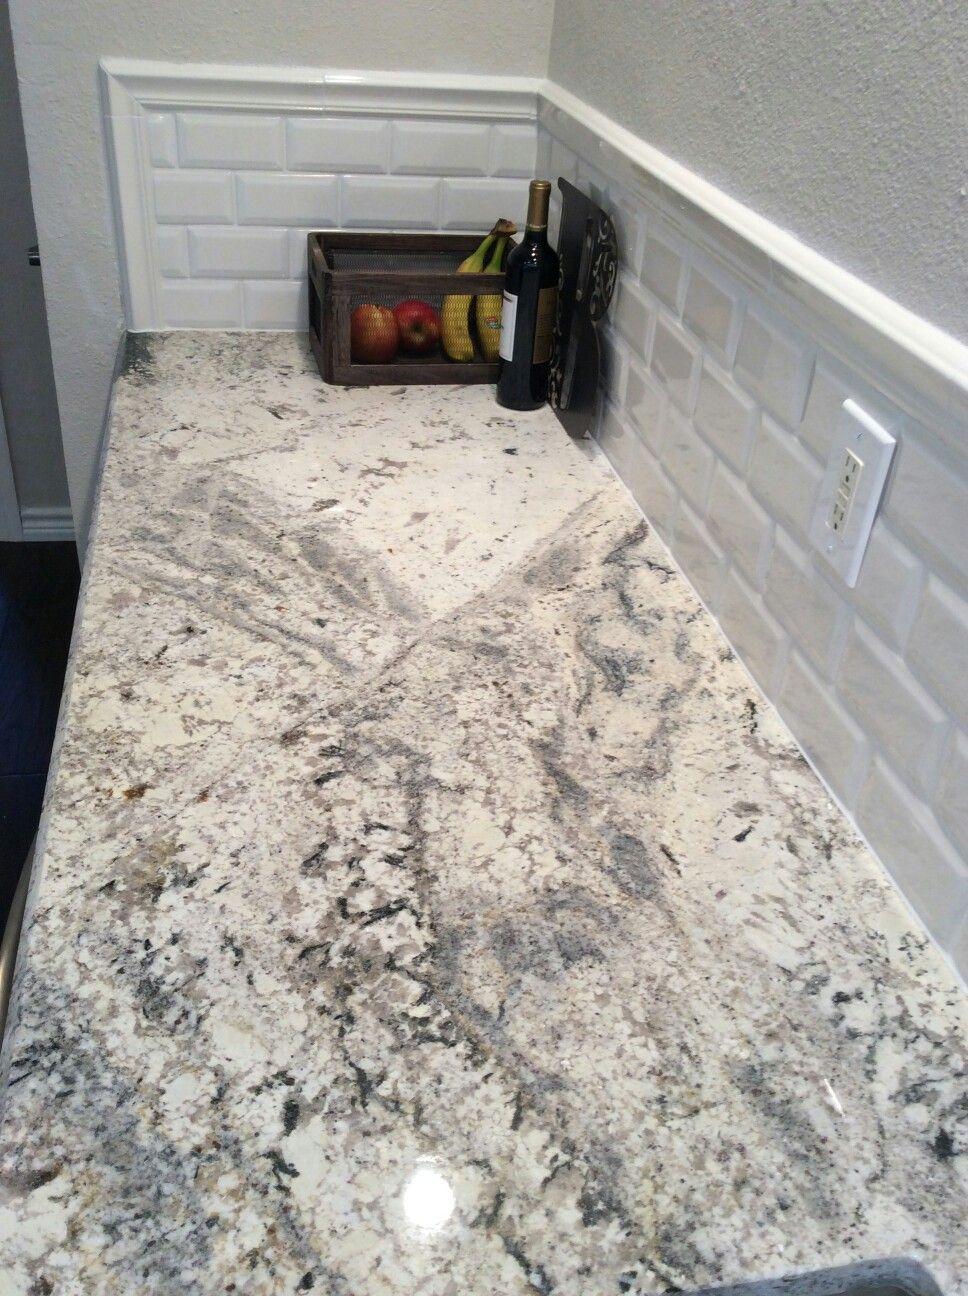 Yummy Romanix Granite From Arizona Tile Splashback Is Yummy Too All By Inri Fabrication In Granite Countertops Kitchen Granite Kitchen Grey Countertops